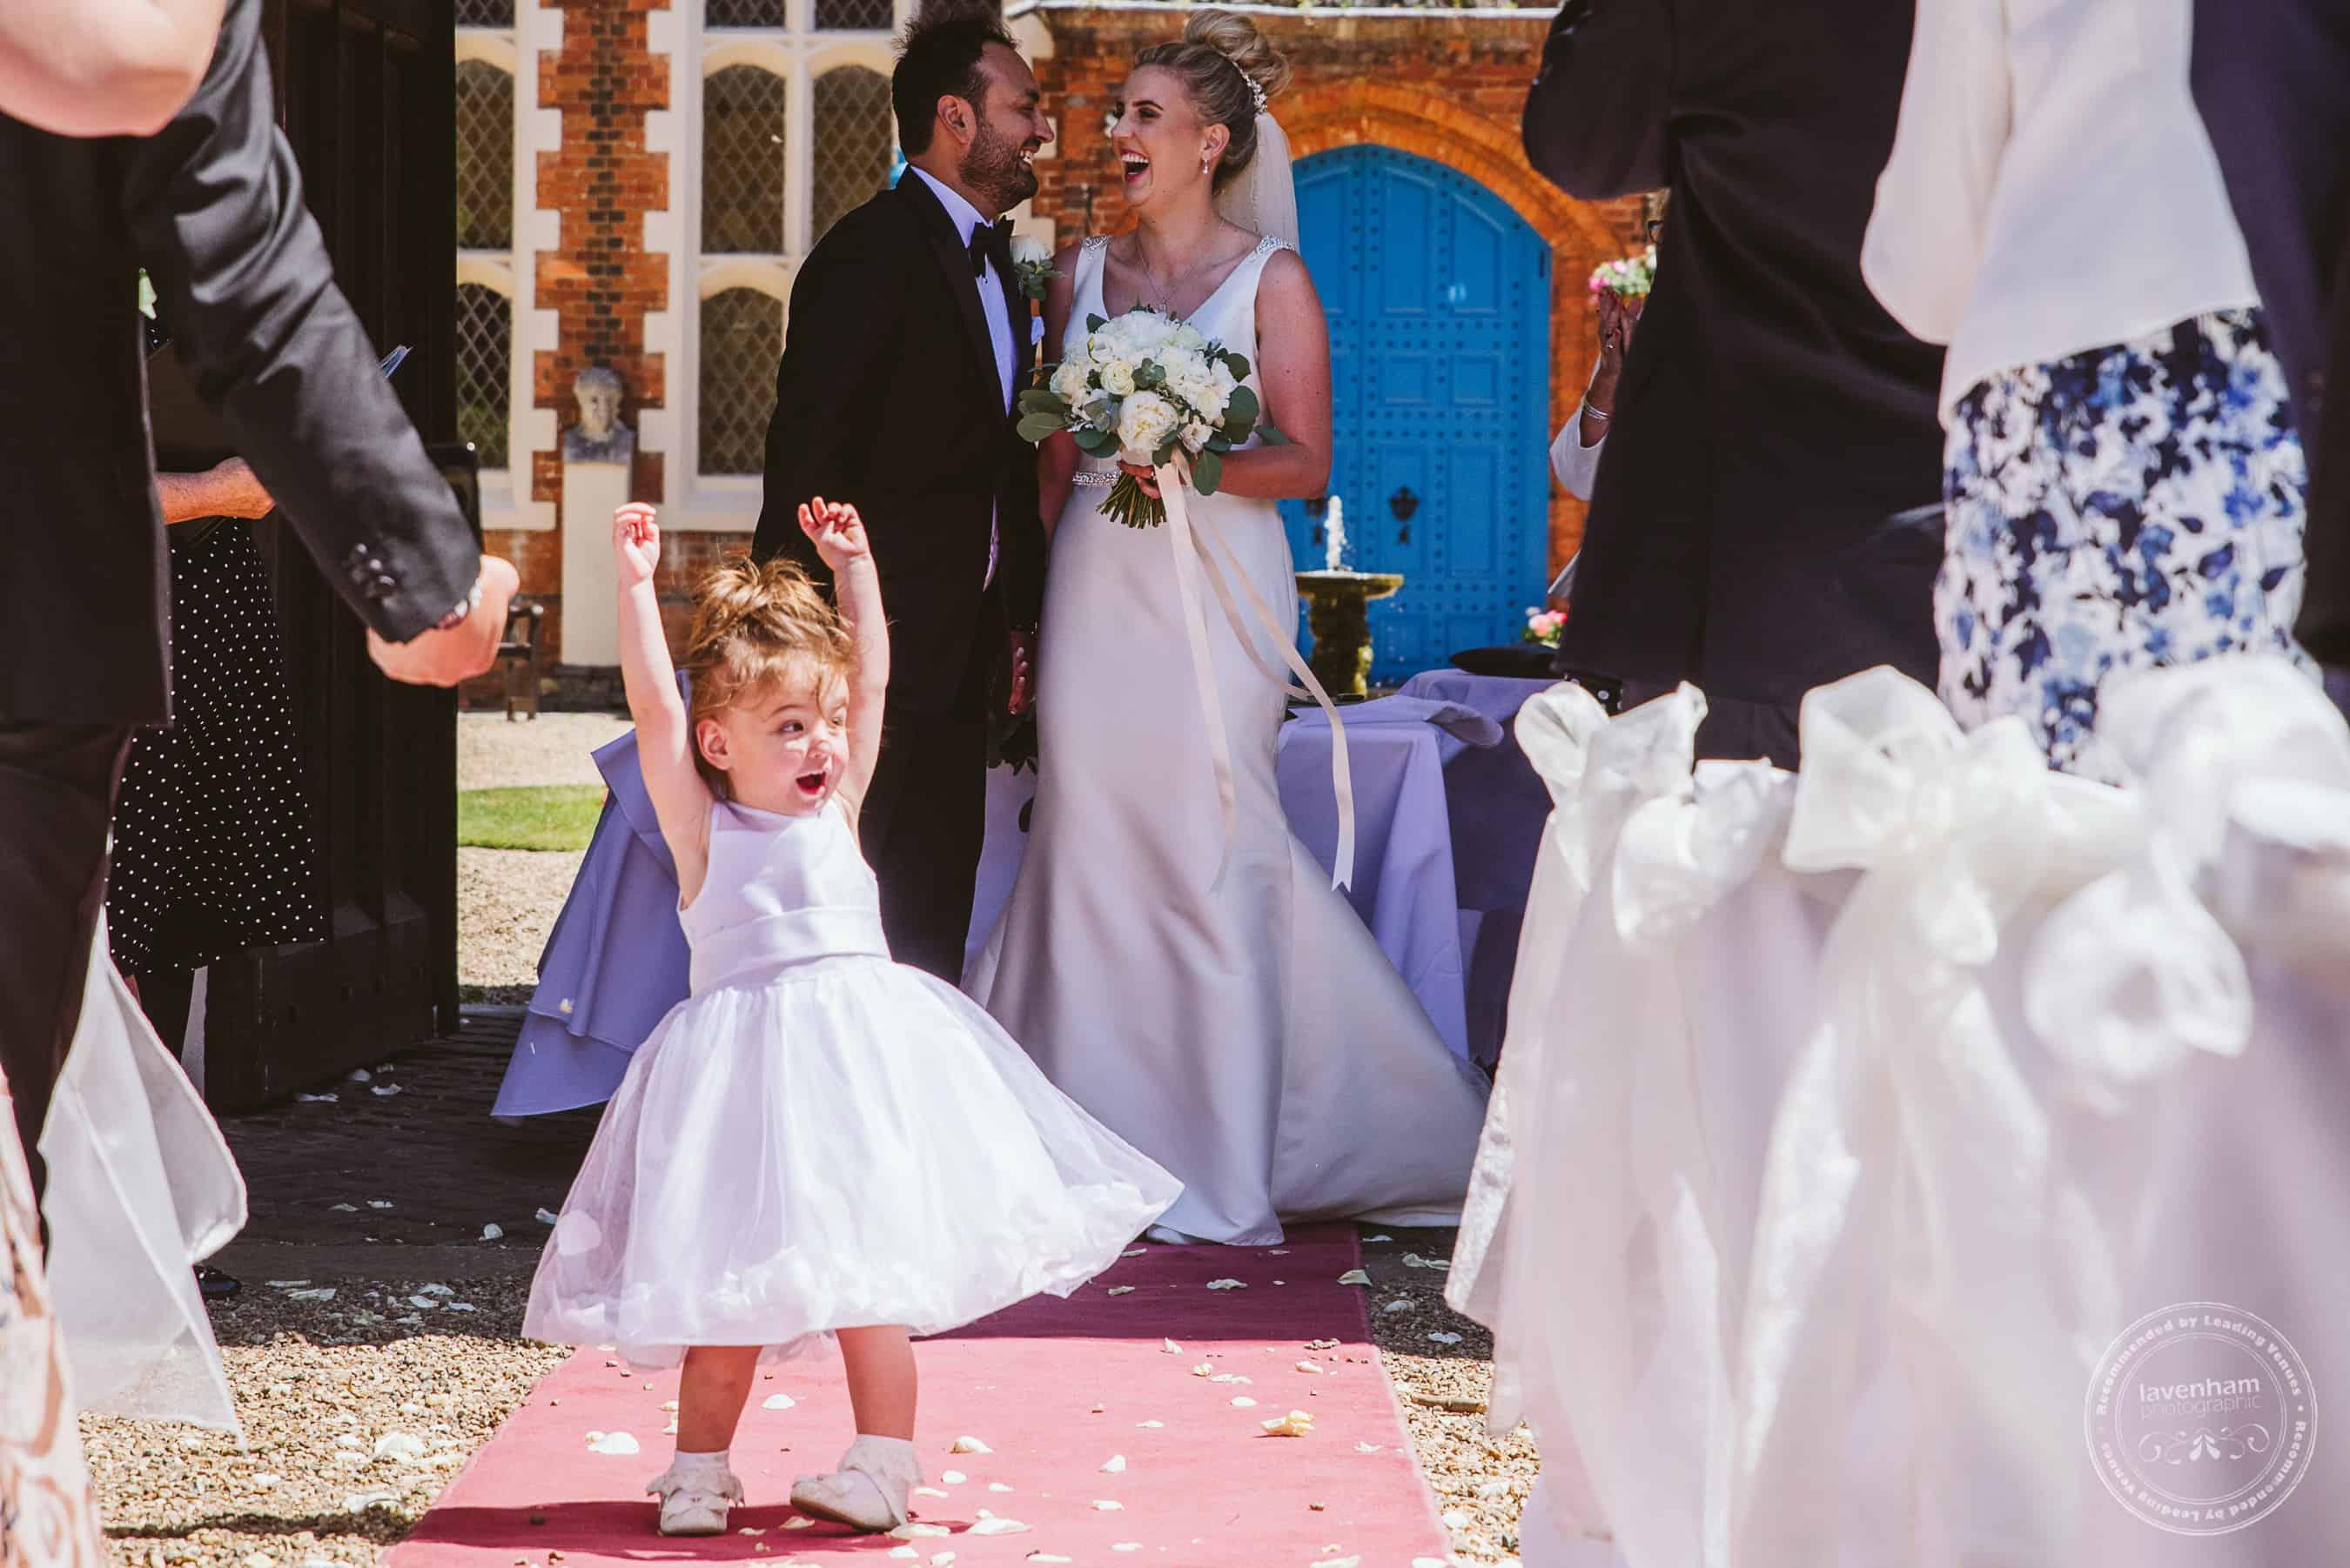 220618 Gosfield Hall Wedding Photography Lavenham Photographic 0088